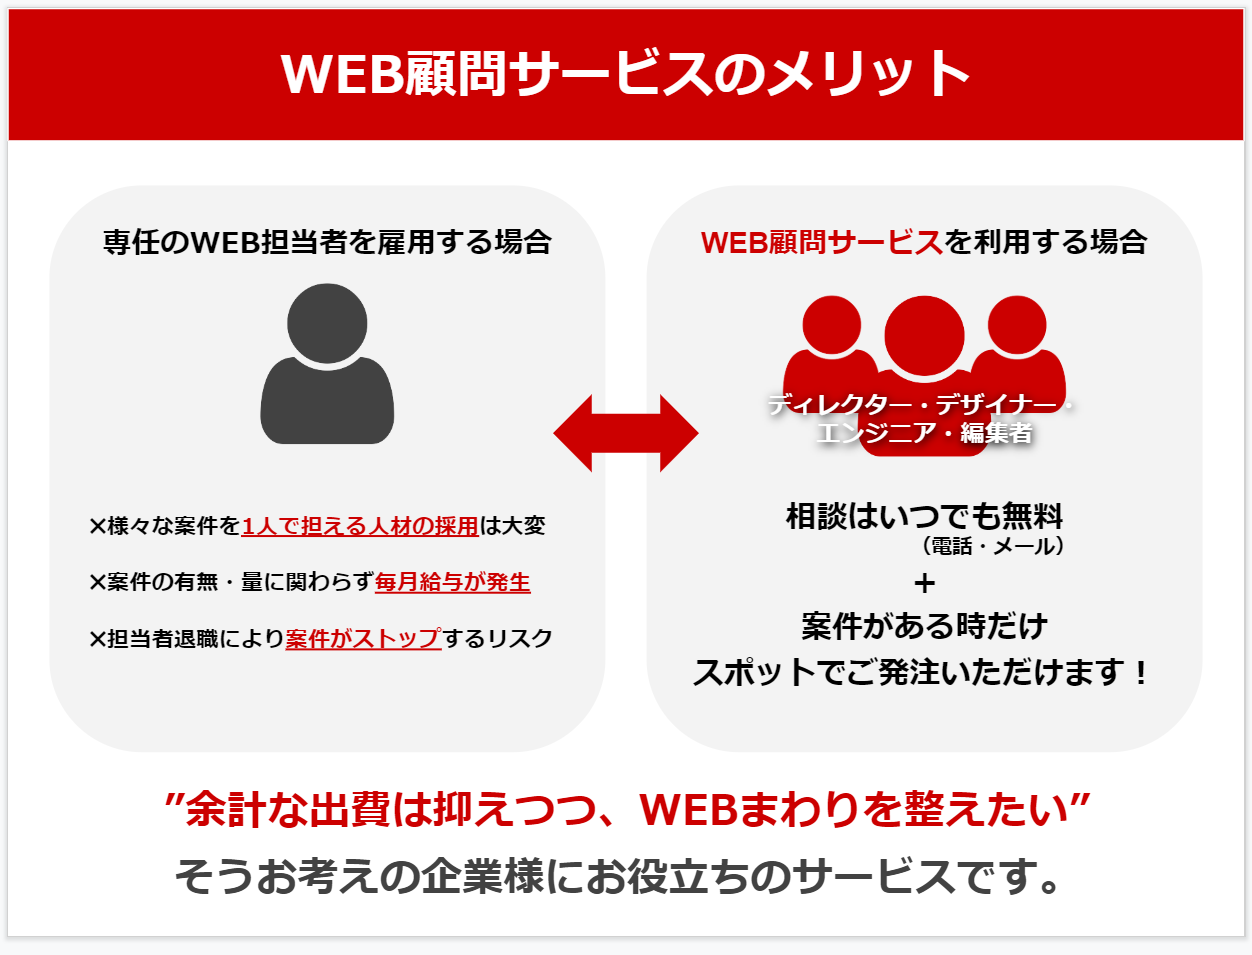 WEB顧問サービスとは